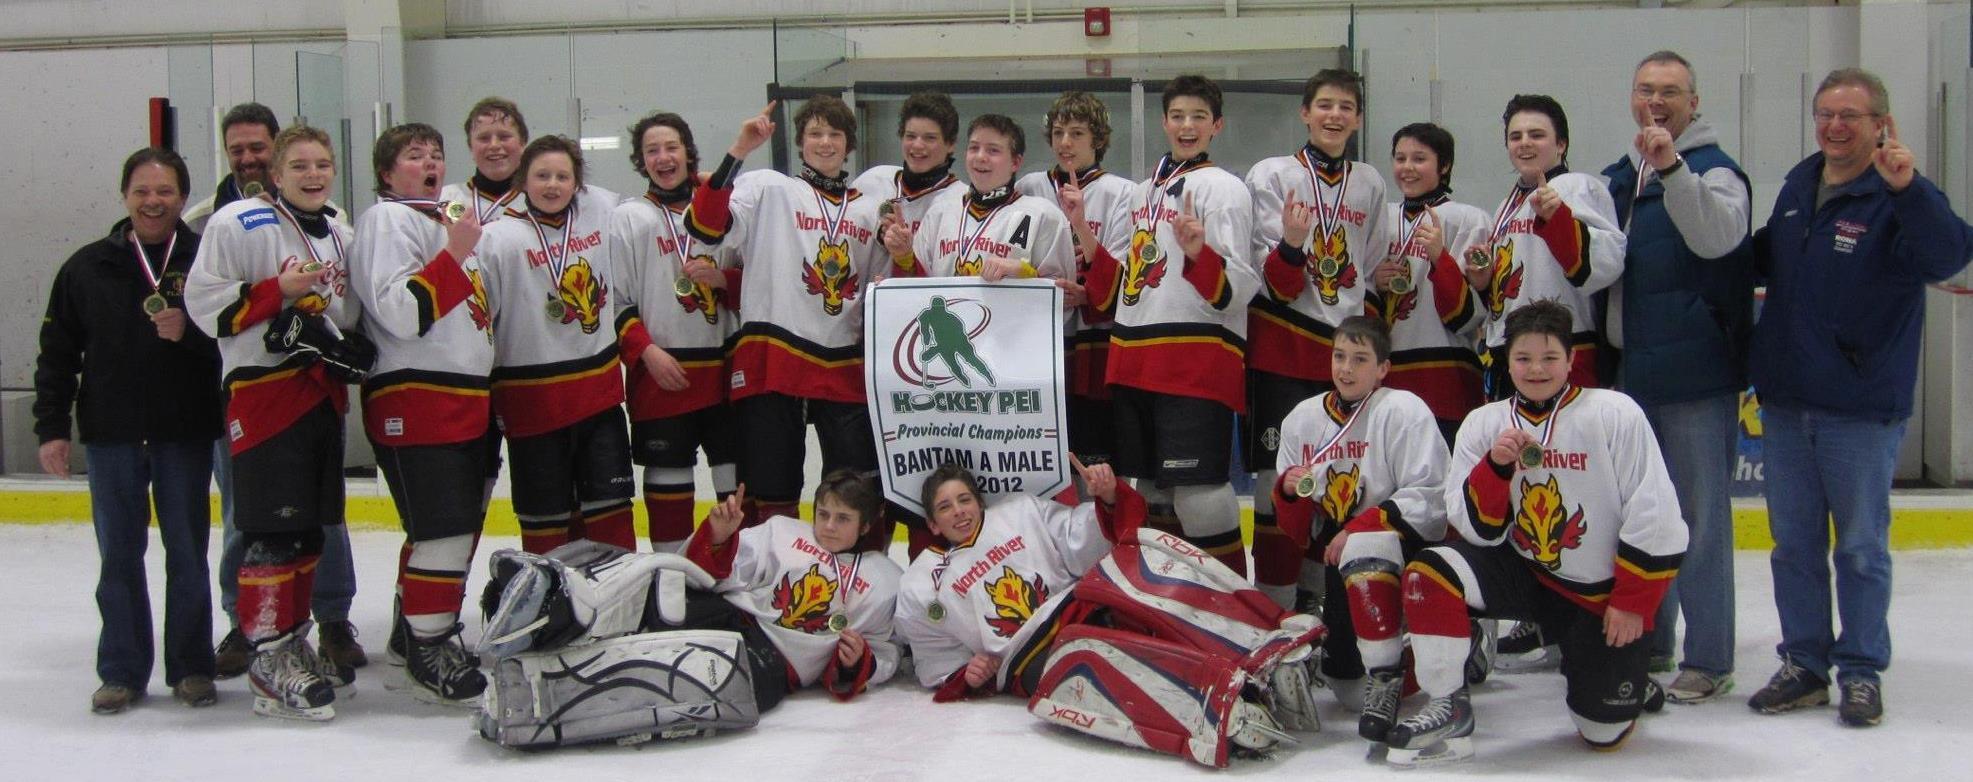 Bantam A Flames Team 3 - 2012 HPEI Provincial Champions